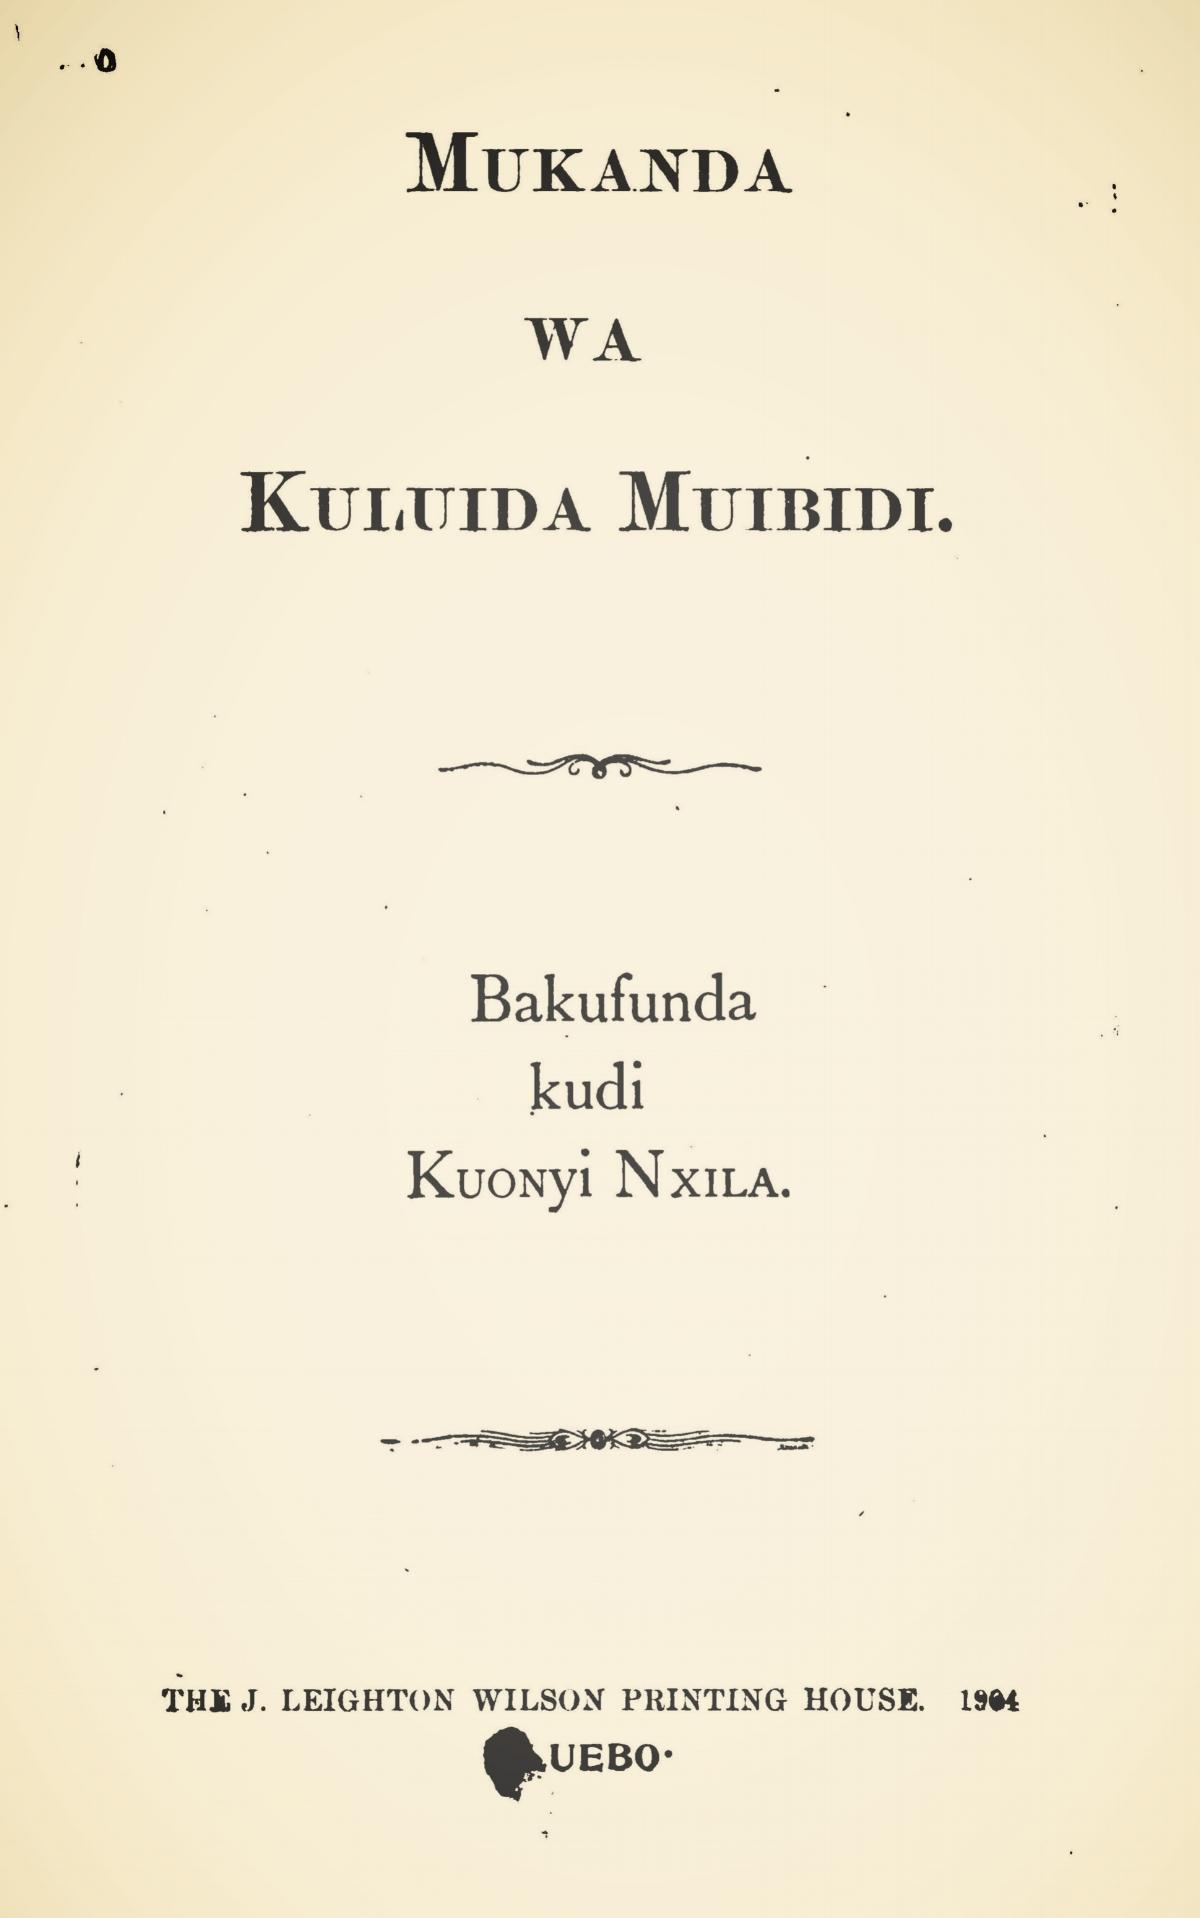 Morrison, William McCutchan, Mukanda Wa Kuluida Muibidi Title Page.jpg